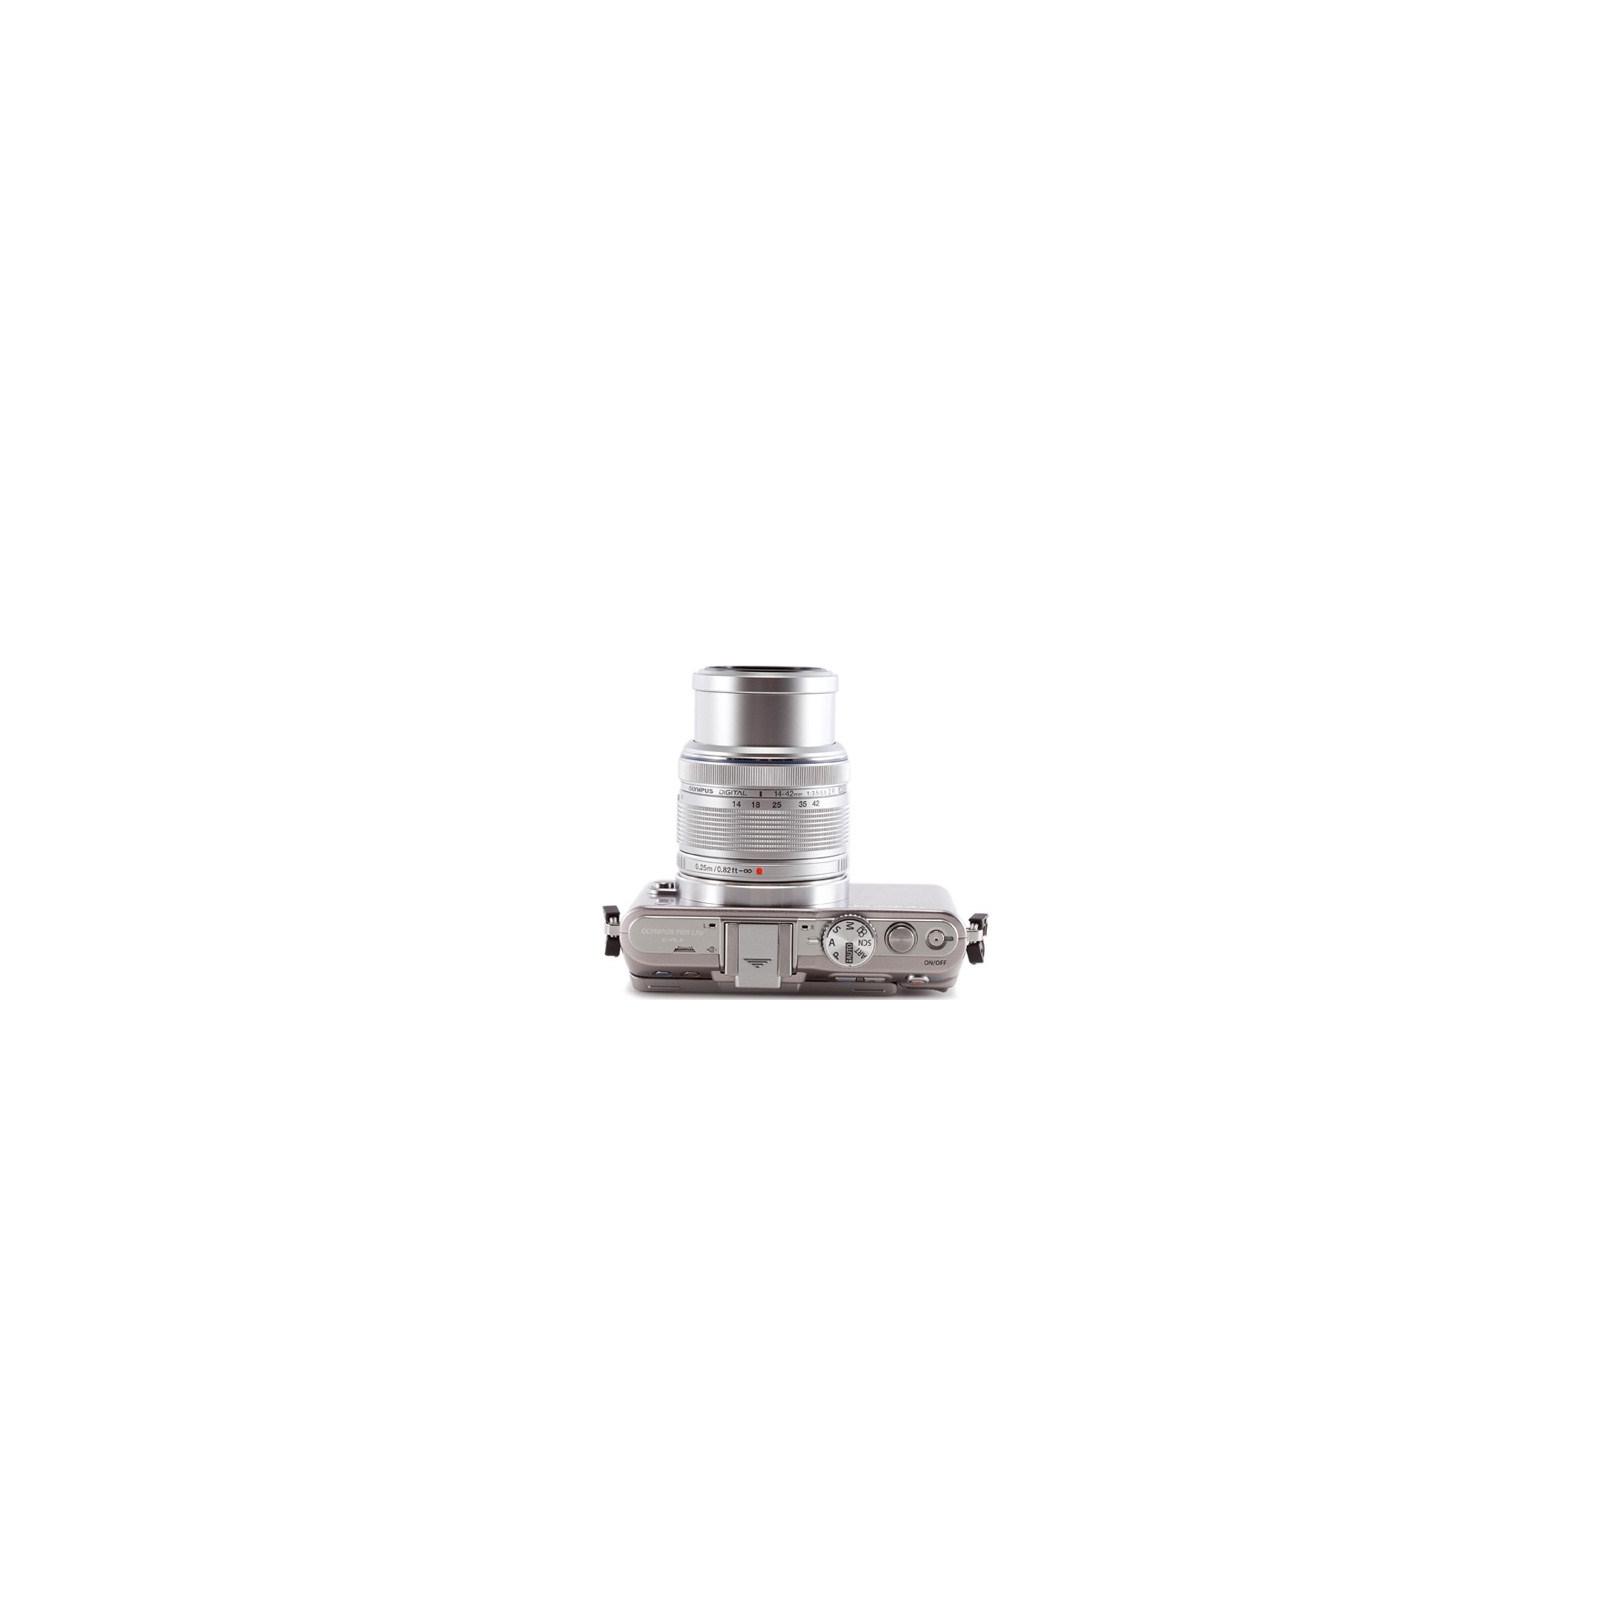 Цифровой фотоаппарат OLYMPUS PEN E-PL3 12-50 mm kit silver/silver (V20503FSE000) изображение 3